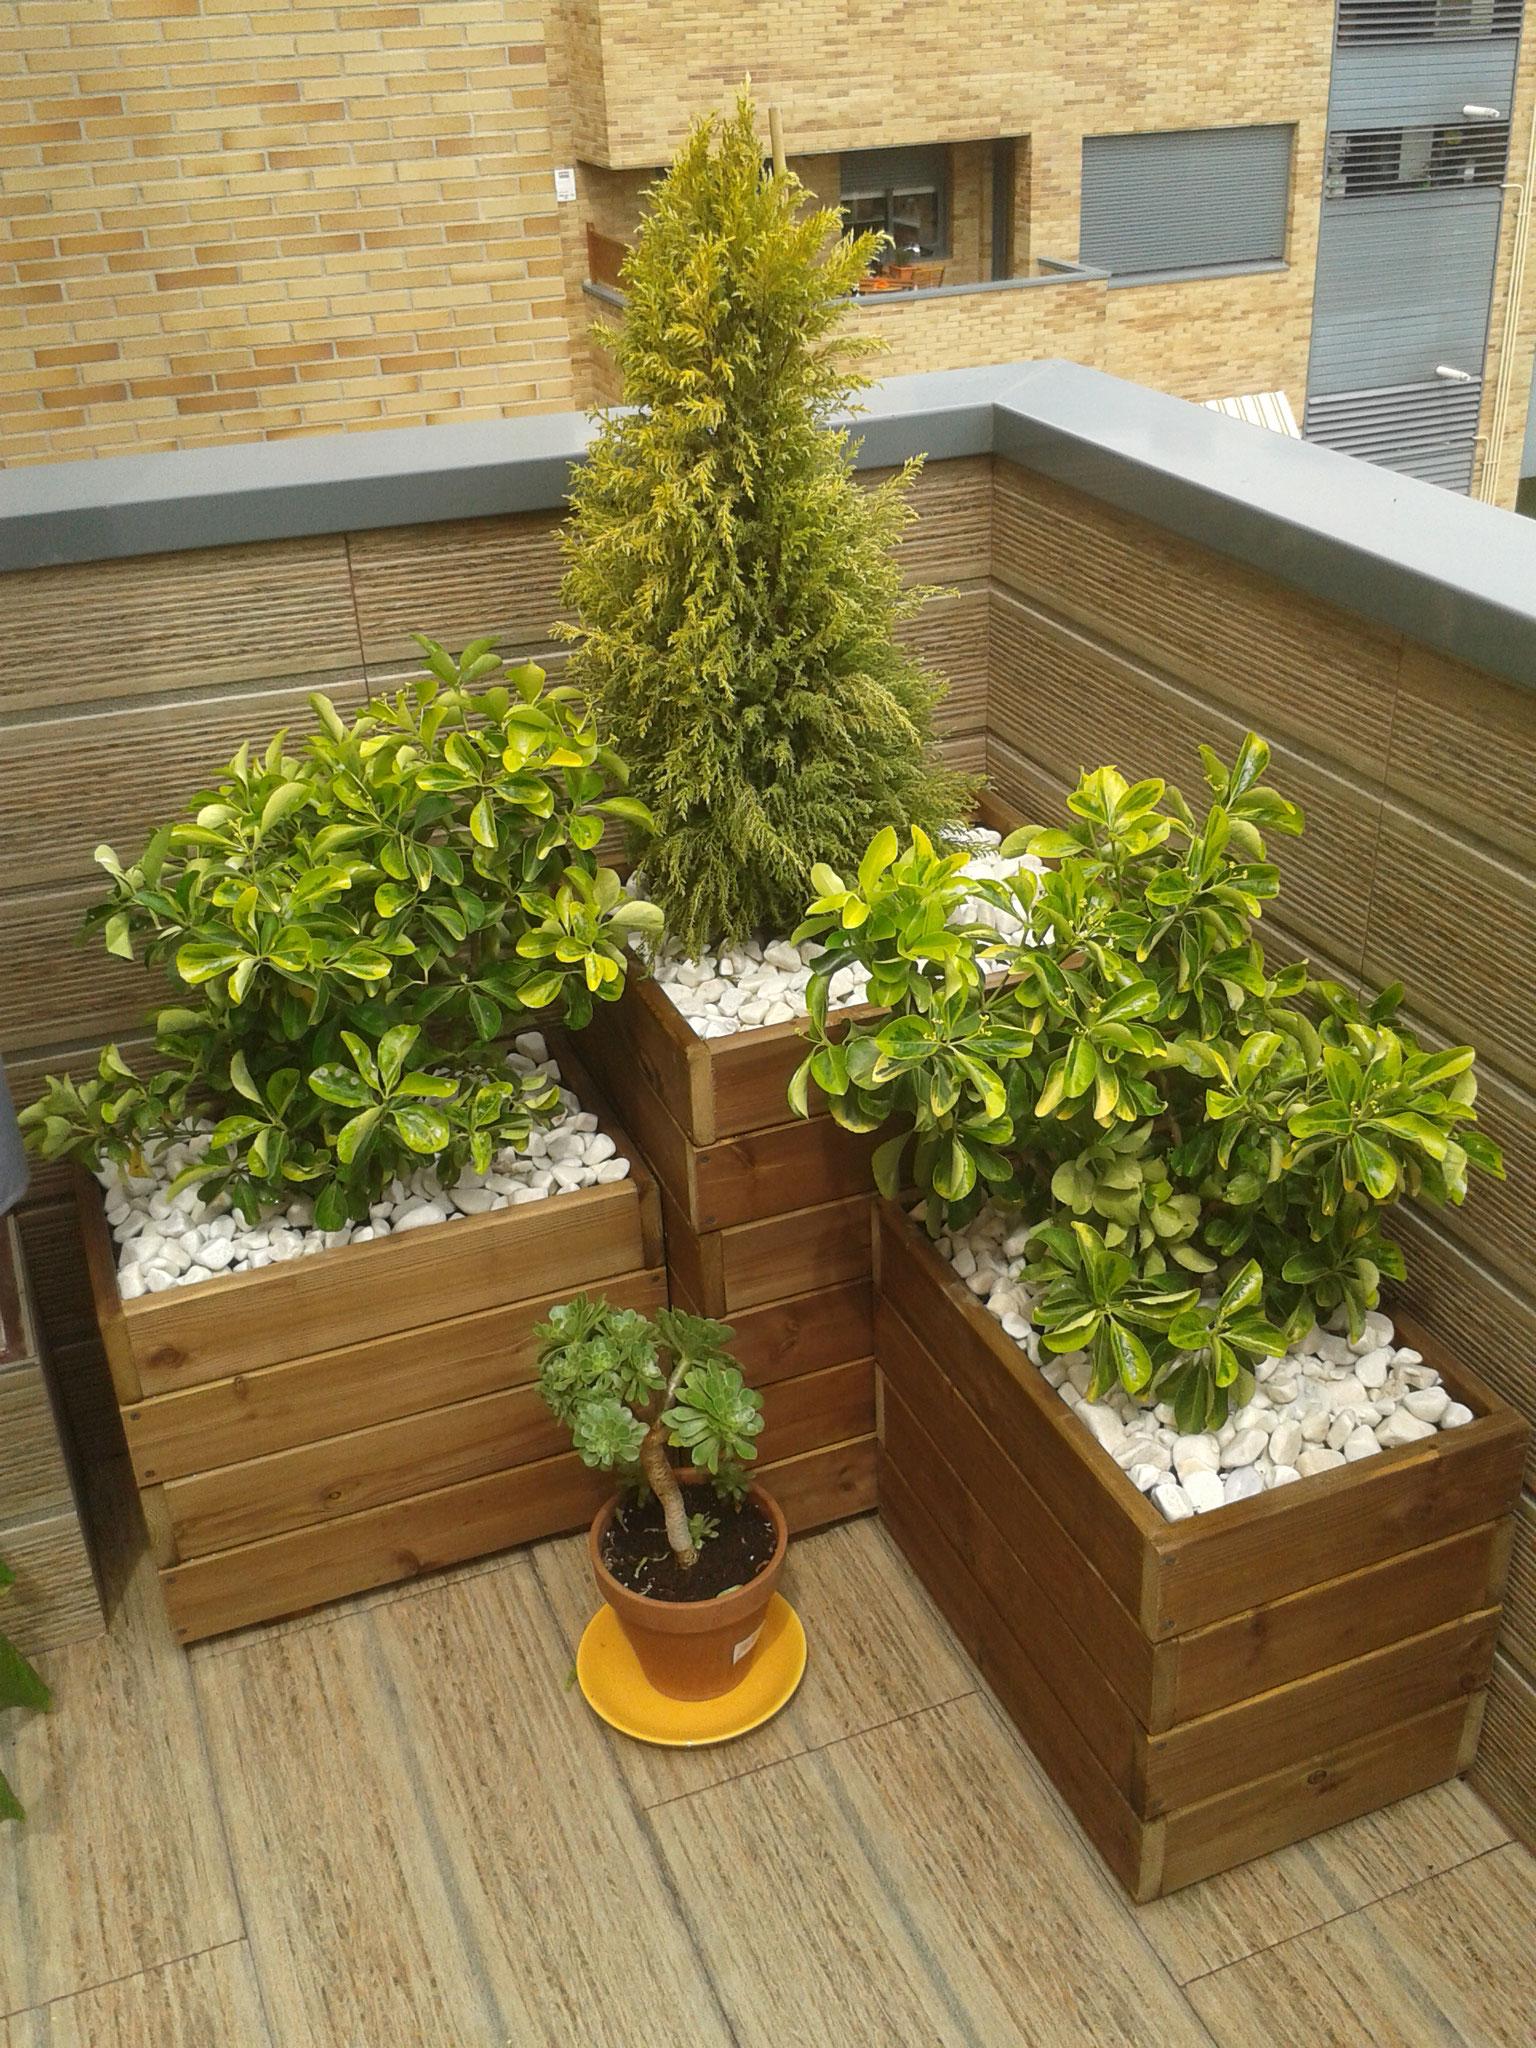 Jardineras al autoclave exterior jardineras de madera for Jardineras para exterior